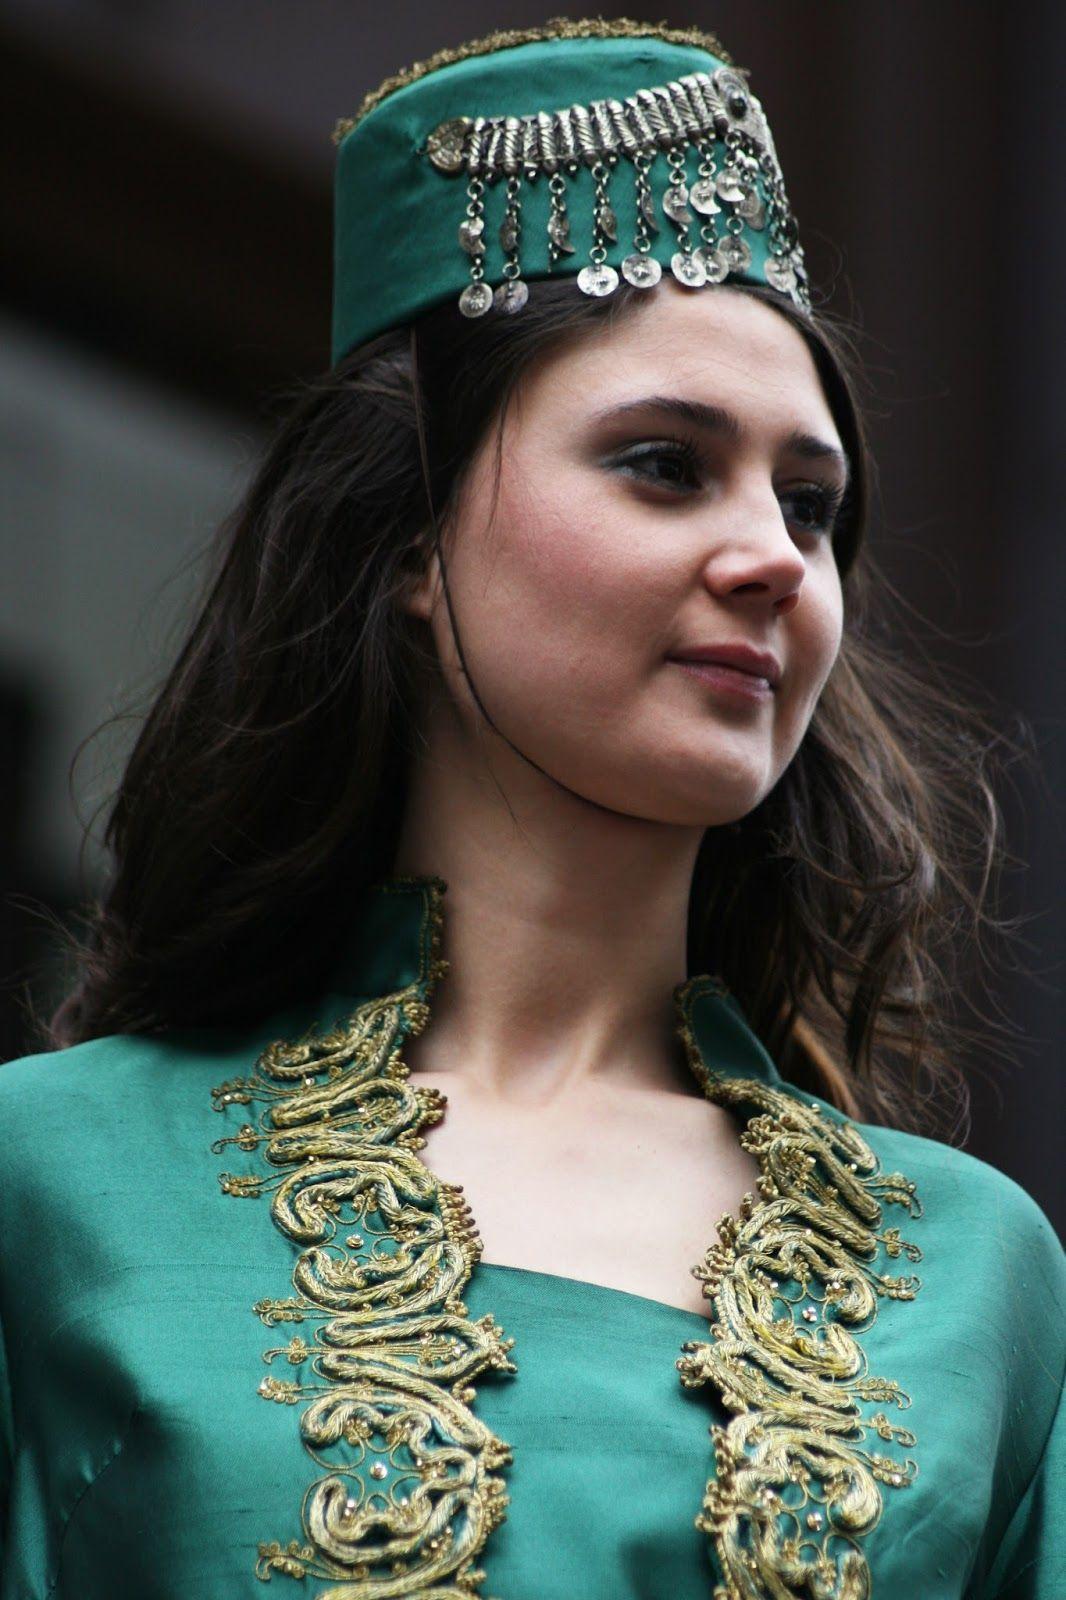 traditional female turkish headwear   Visual Identity   Wizard of oz